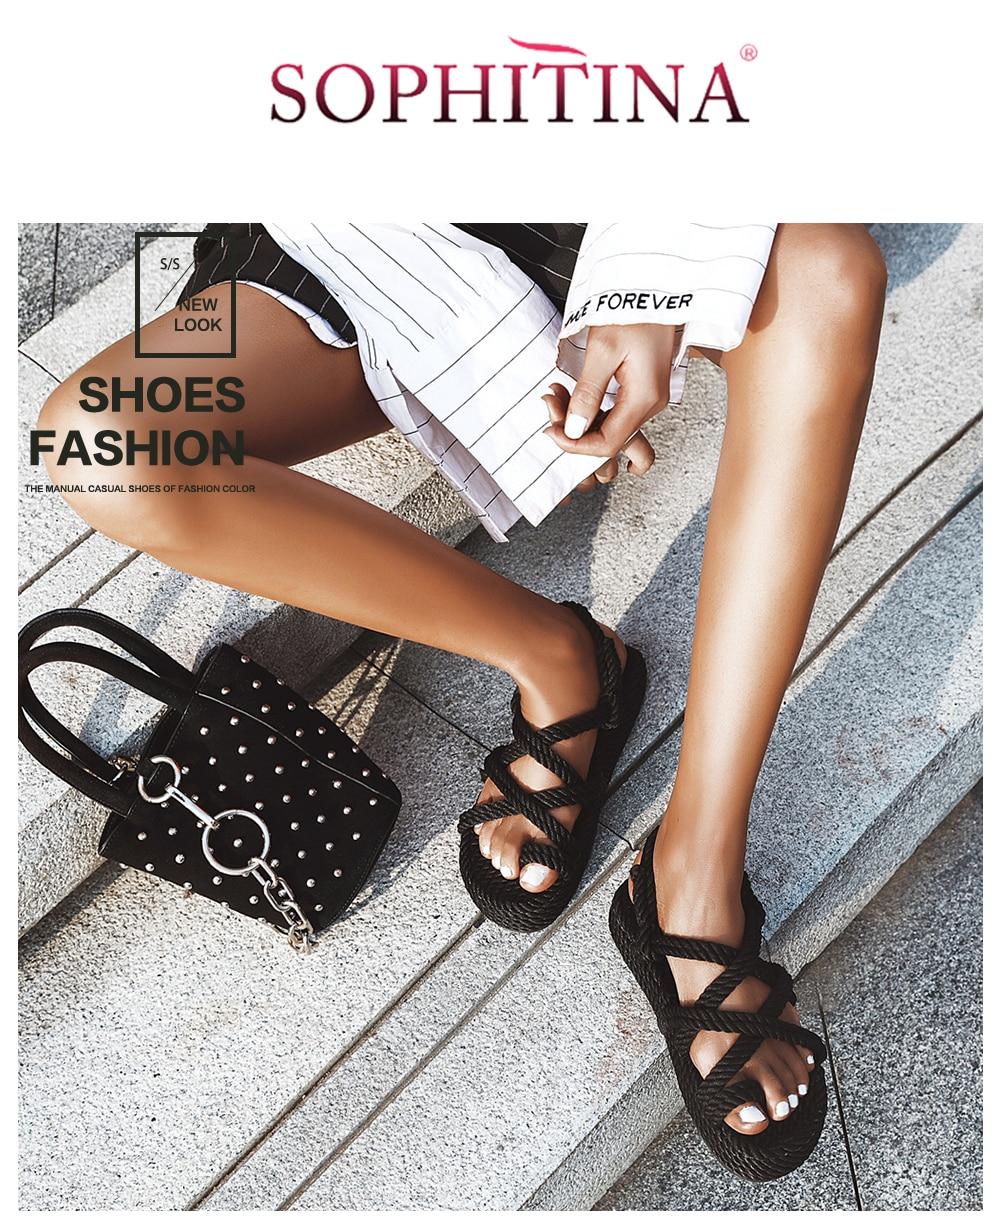 Po448 : po448, SOPHITINA, Fashion, Women', Sandals, Toepost, Design, Strap, Quality, Shoes, Summer, Stylish, PO448|Middle, Heels|, AliExpress